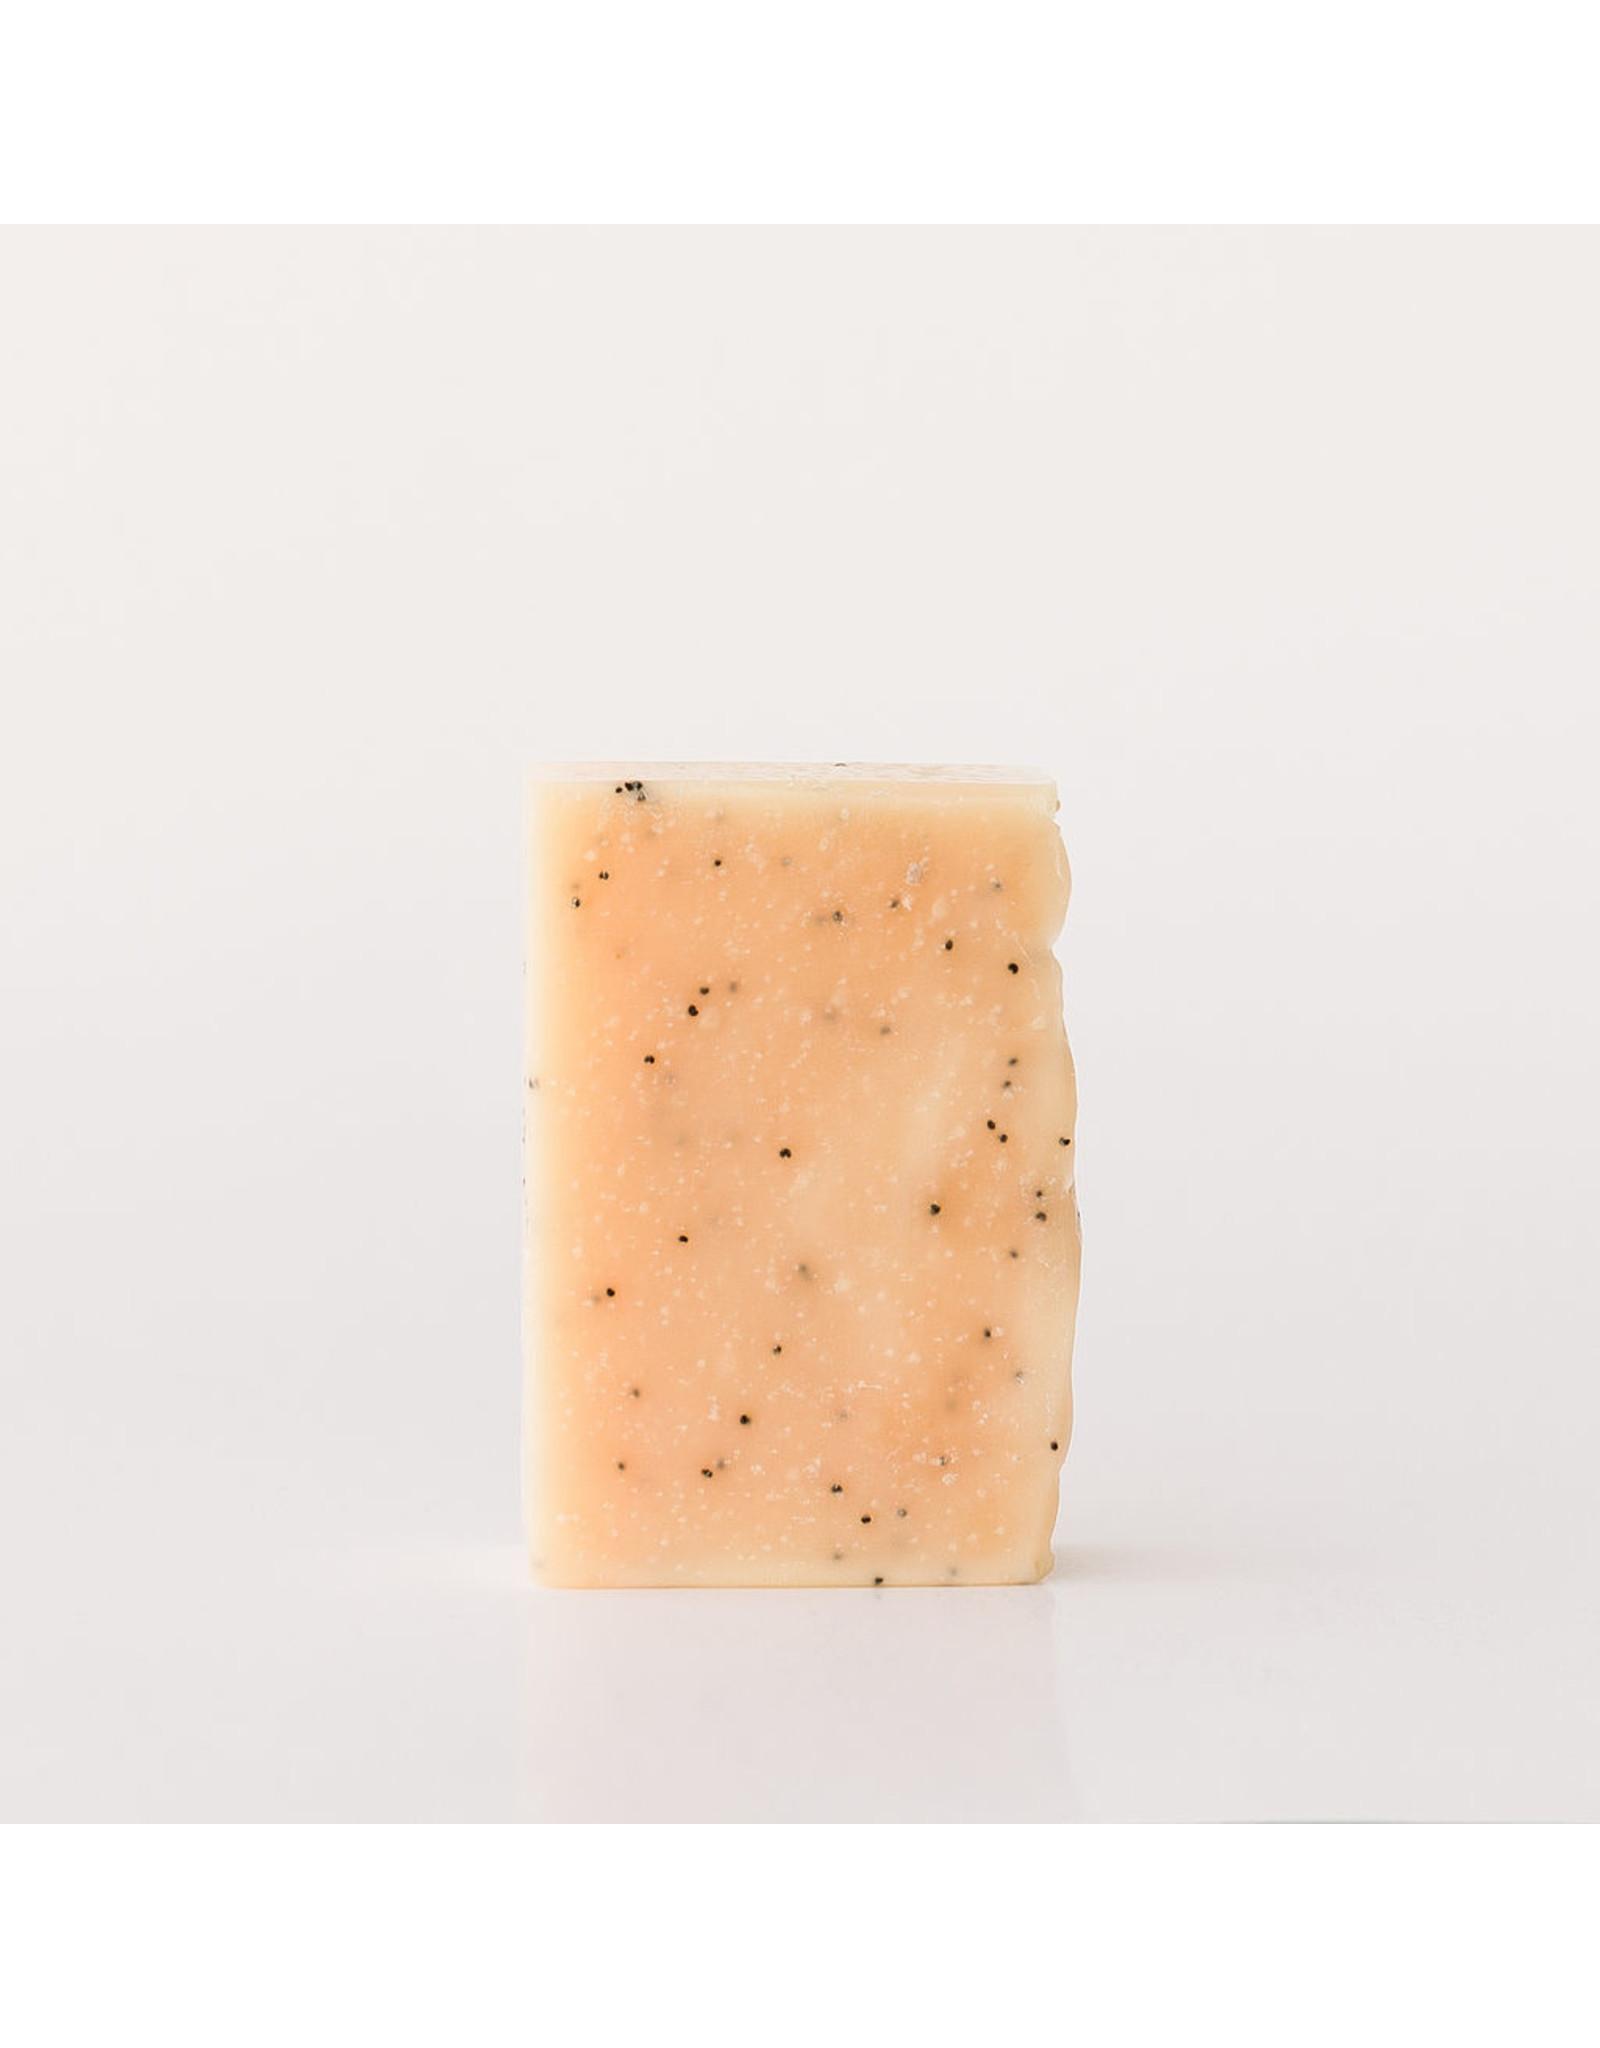 Garden City Essentials GCE Nourishing Soap Bars